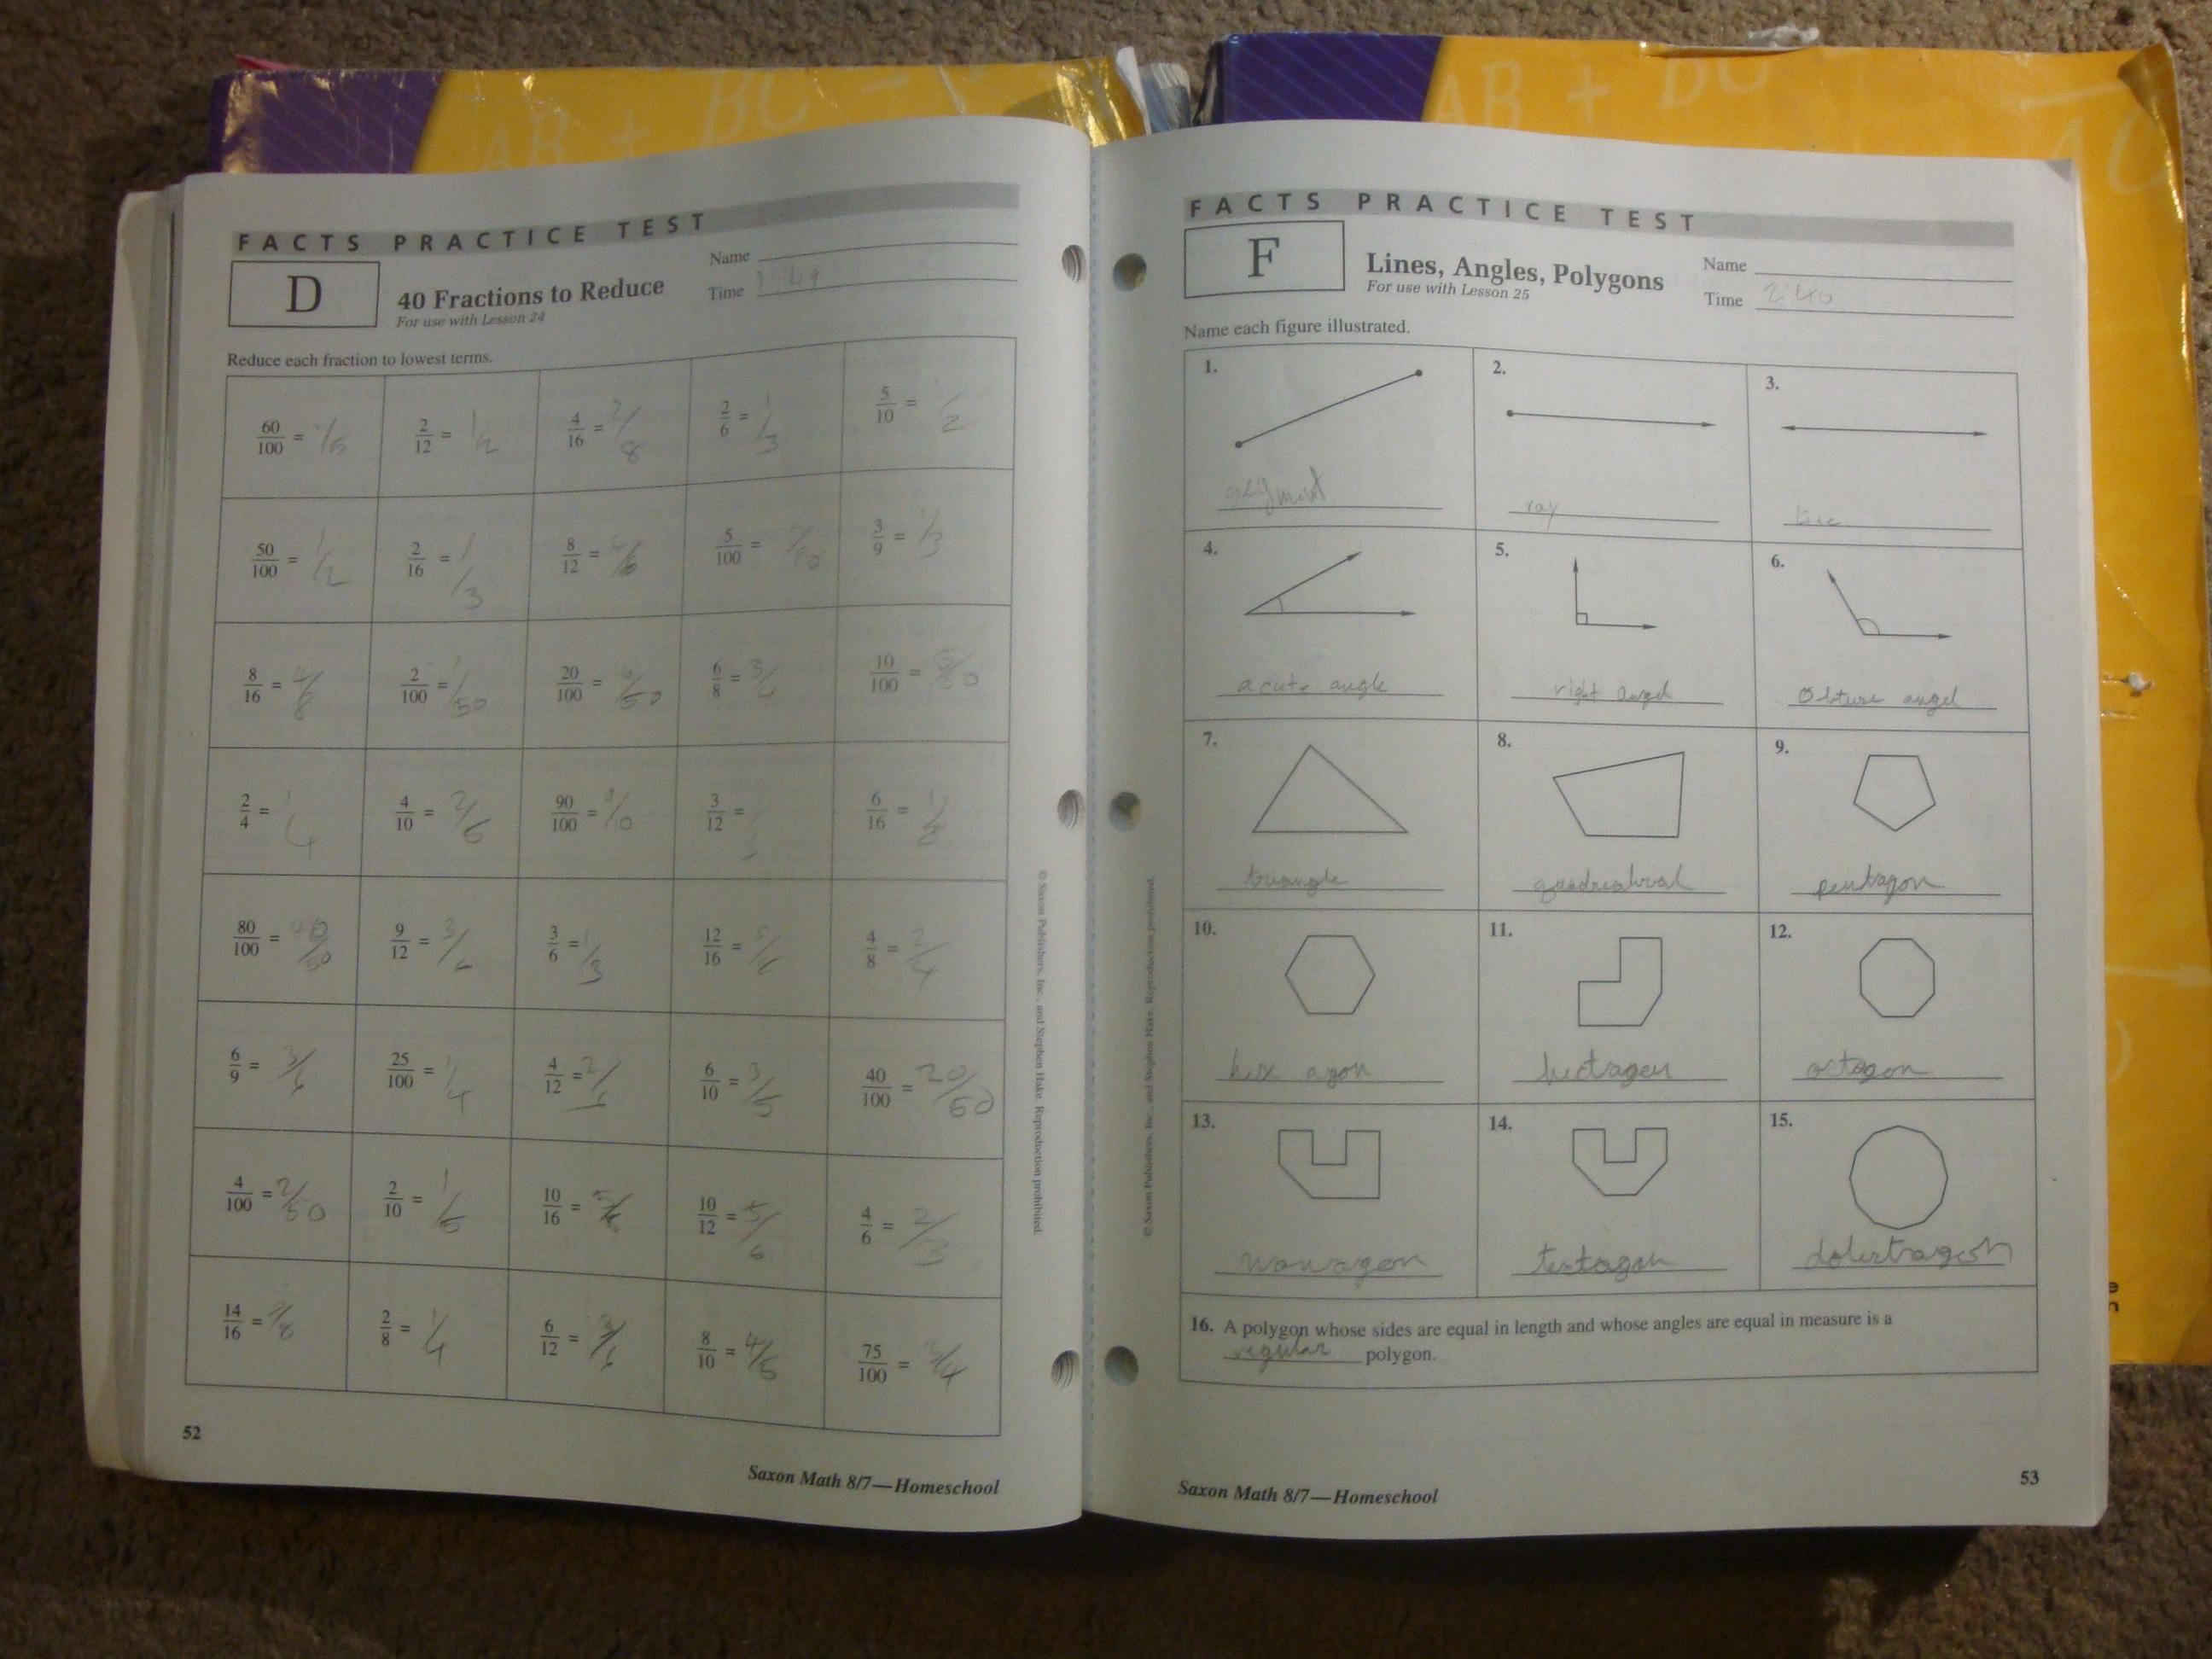 Saxon Math Grade 8 7 Homeschool Travelers